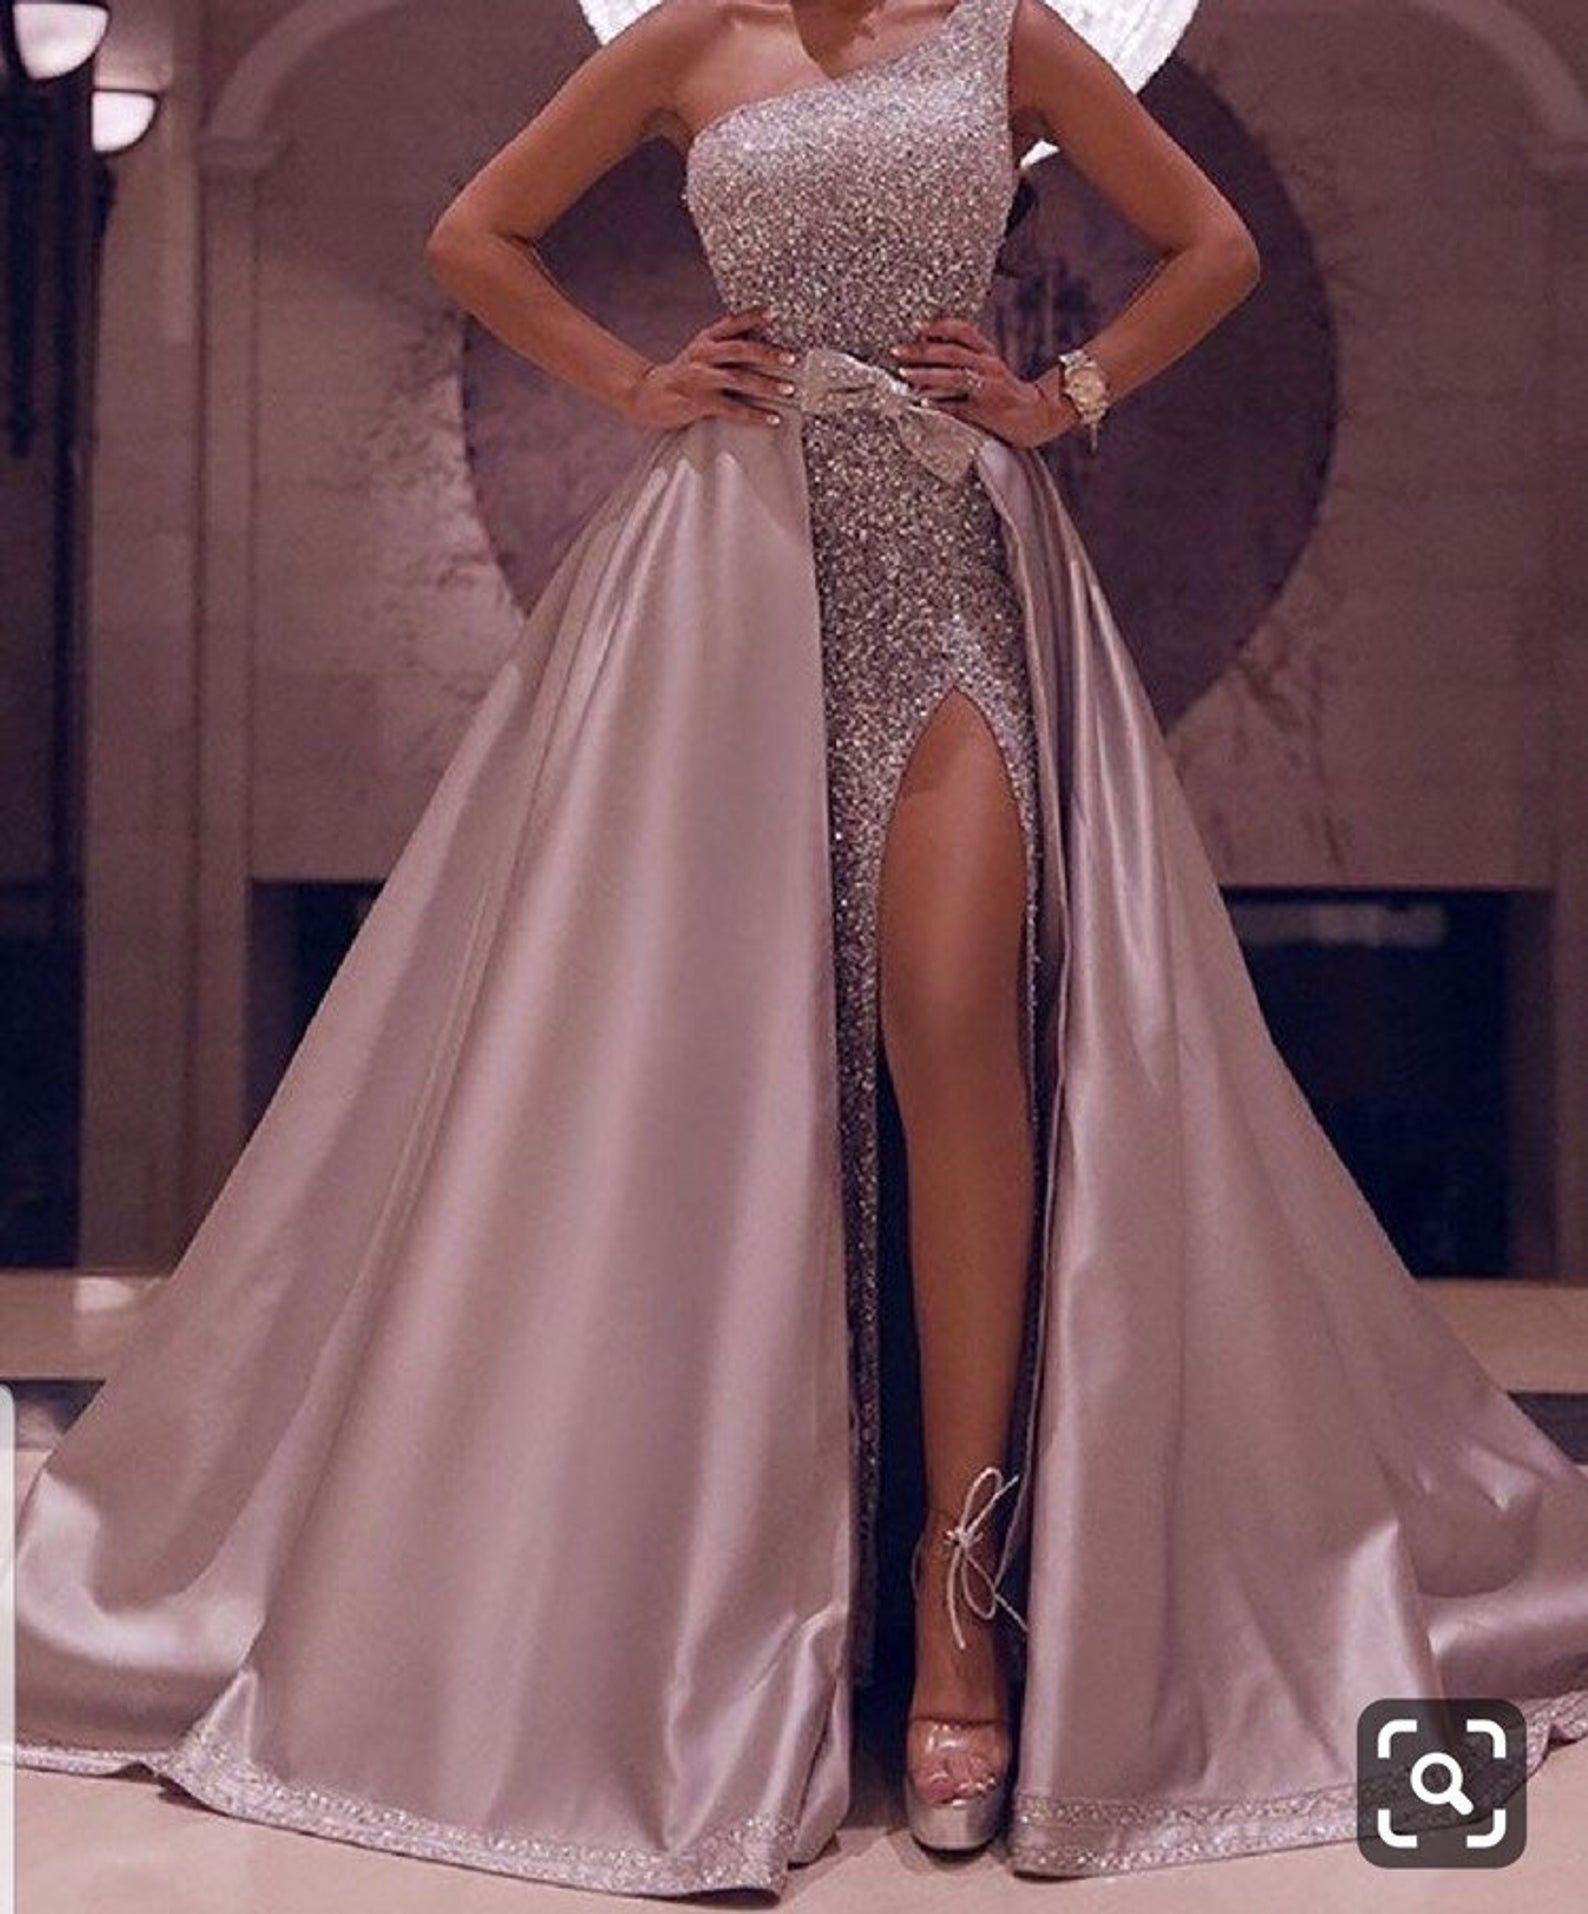 Sequins Prom Dress With Detachable Cape Prom Gowns African Prom Dress Cape African Wedding Dress Wedding Reception Dress Dashiki Prom Dress Evening Dresses For Weddings Prom Dresses African Prom Dresses [ 1914 x 1588 Pixel ]